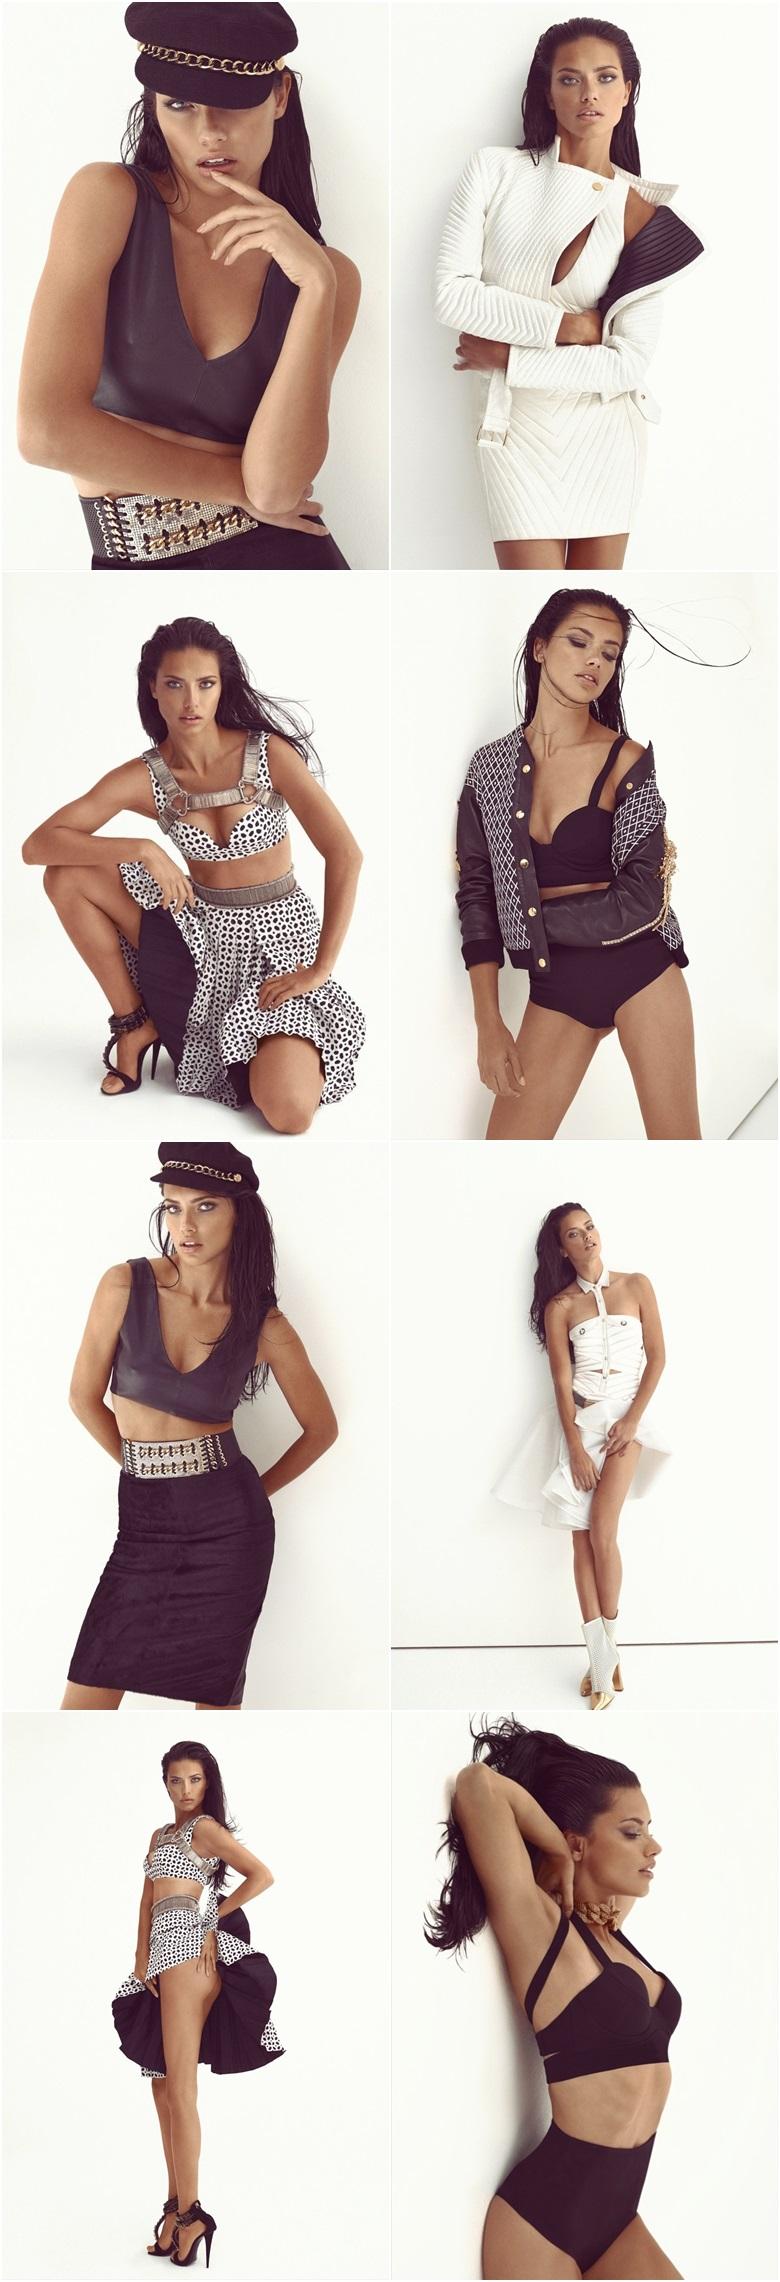 adriana-lima-fashion4addicts.com